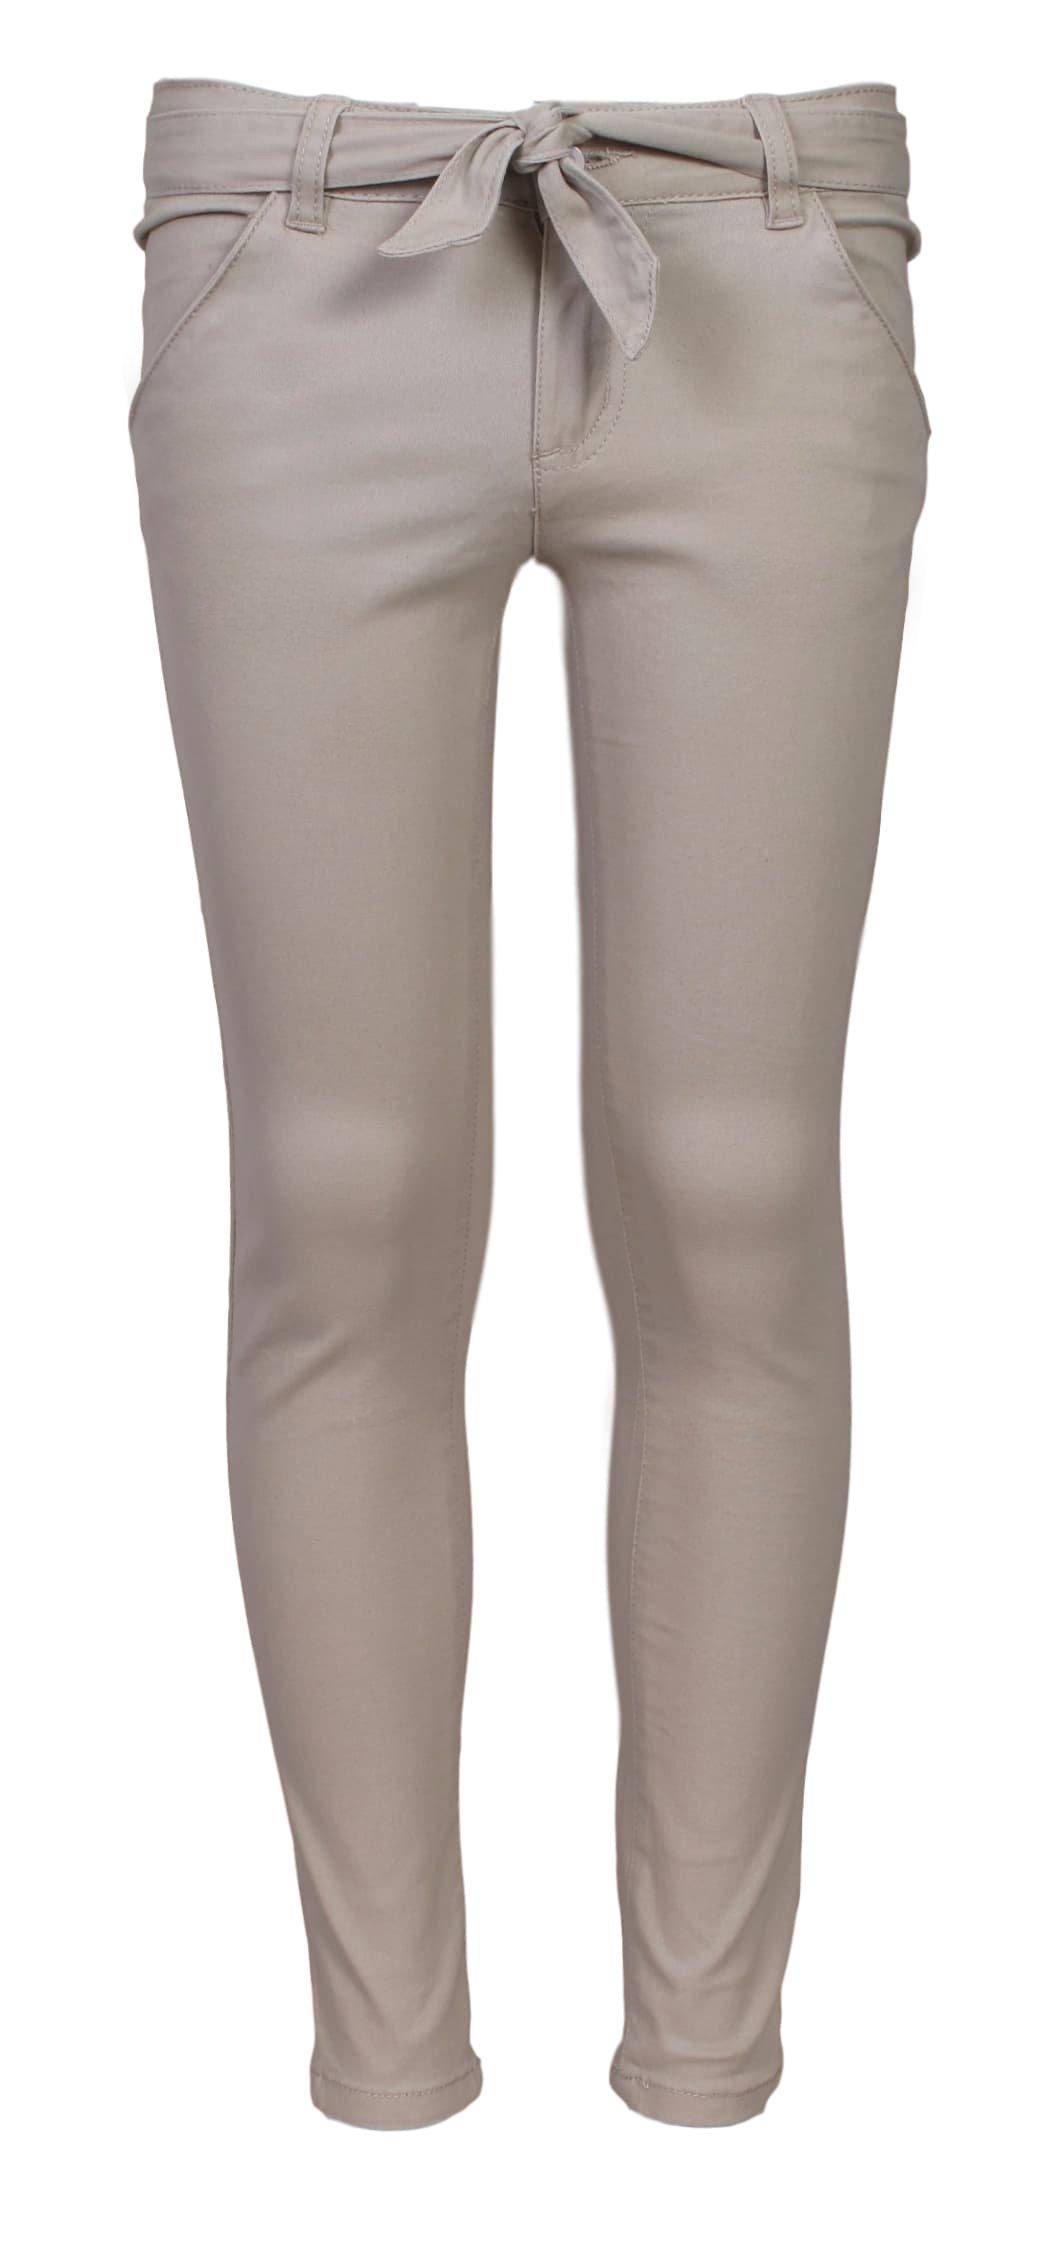 'Beverly Hills Polo Club Girls School Uniform Skinny Flat Front Stretch Twill Pants, Khaki, Size 10'